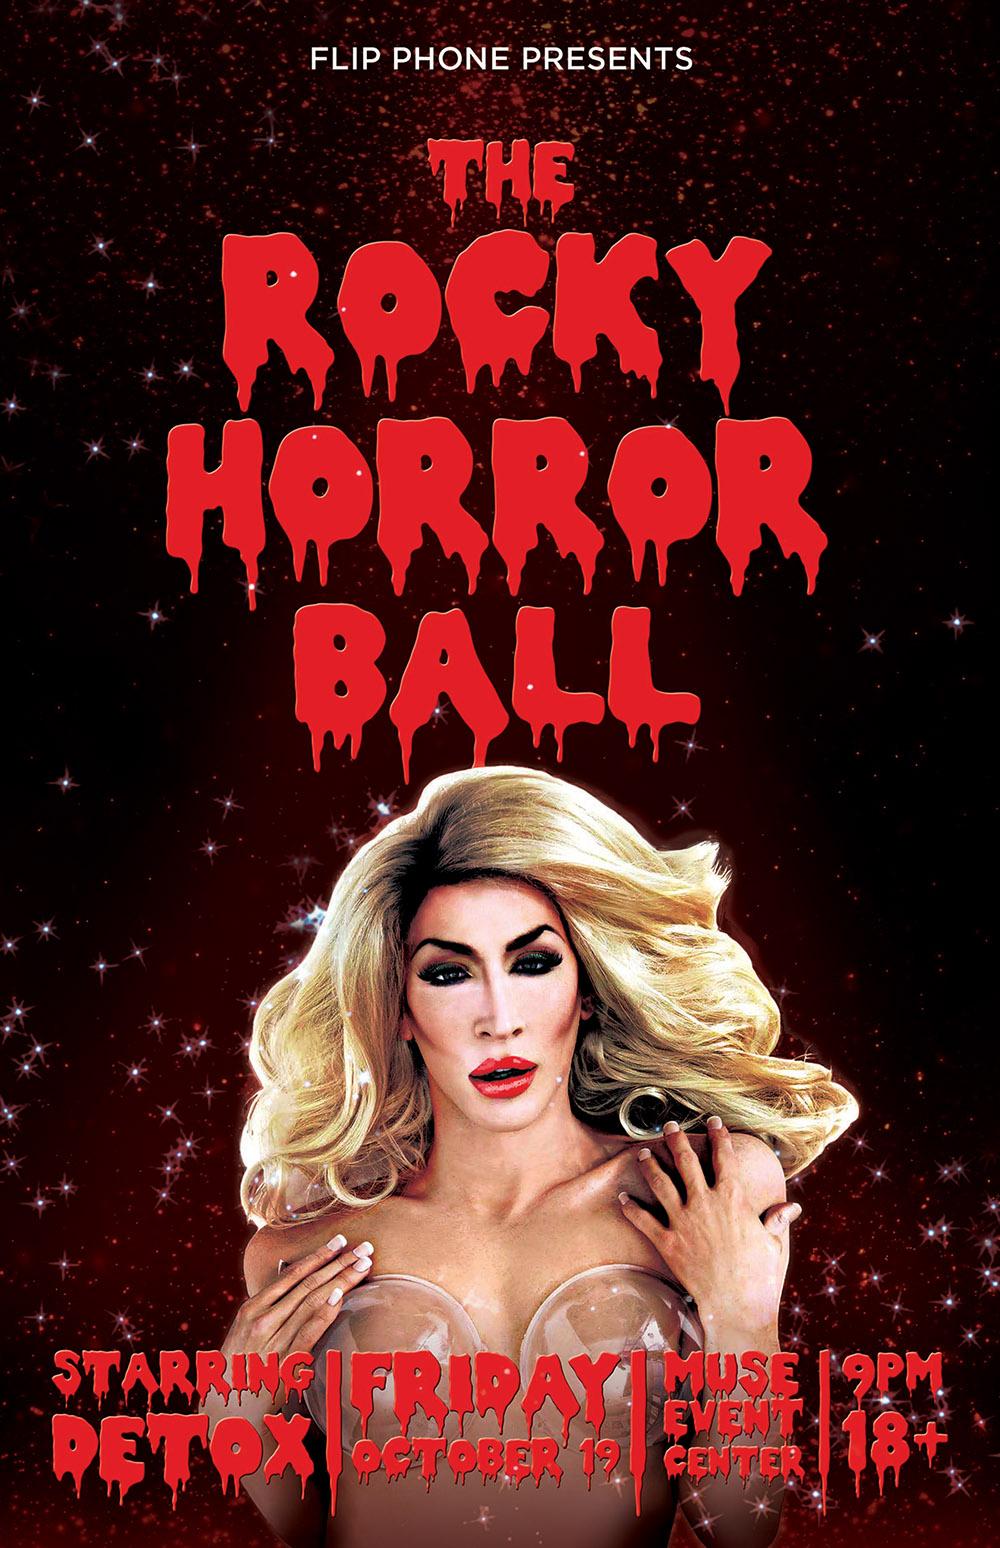 FP-RockyHorror-Poster-Web.jpg